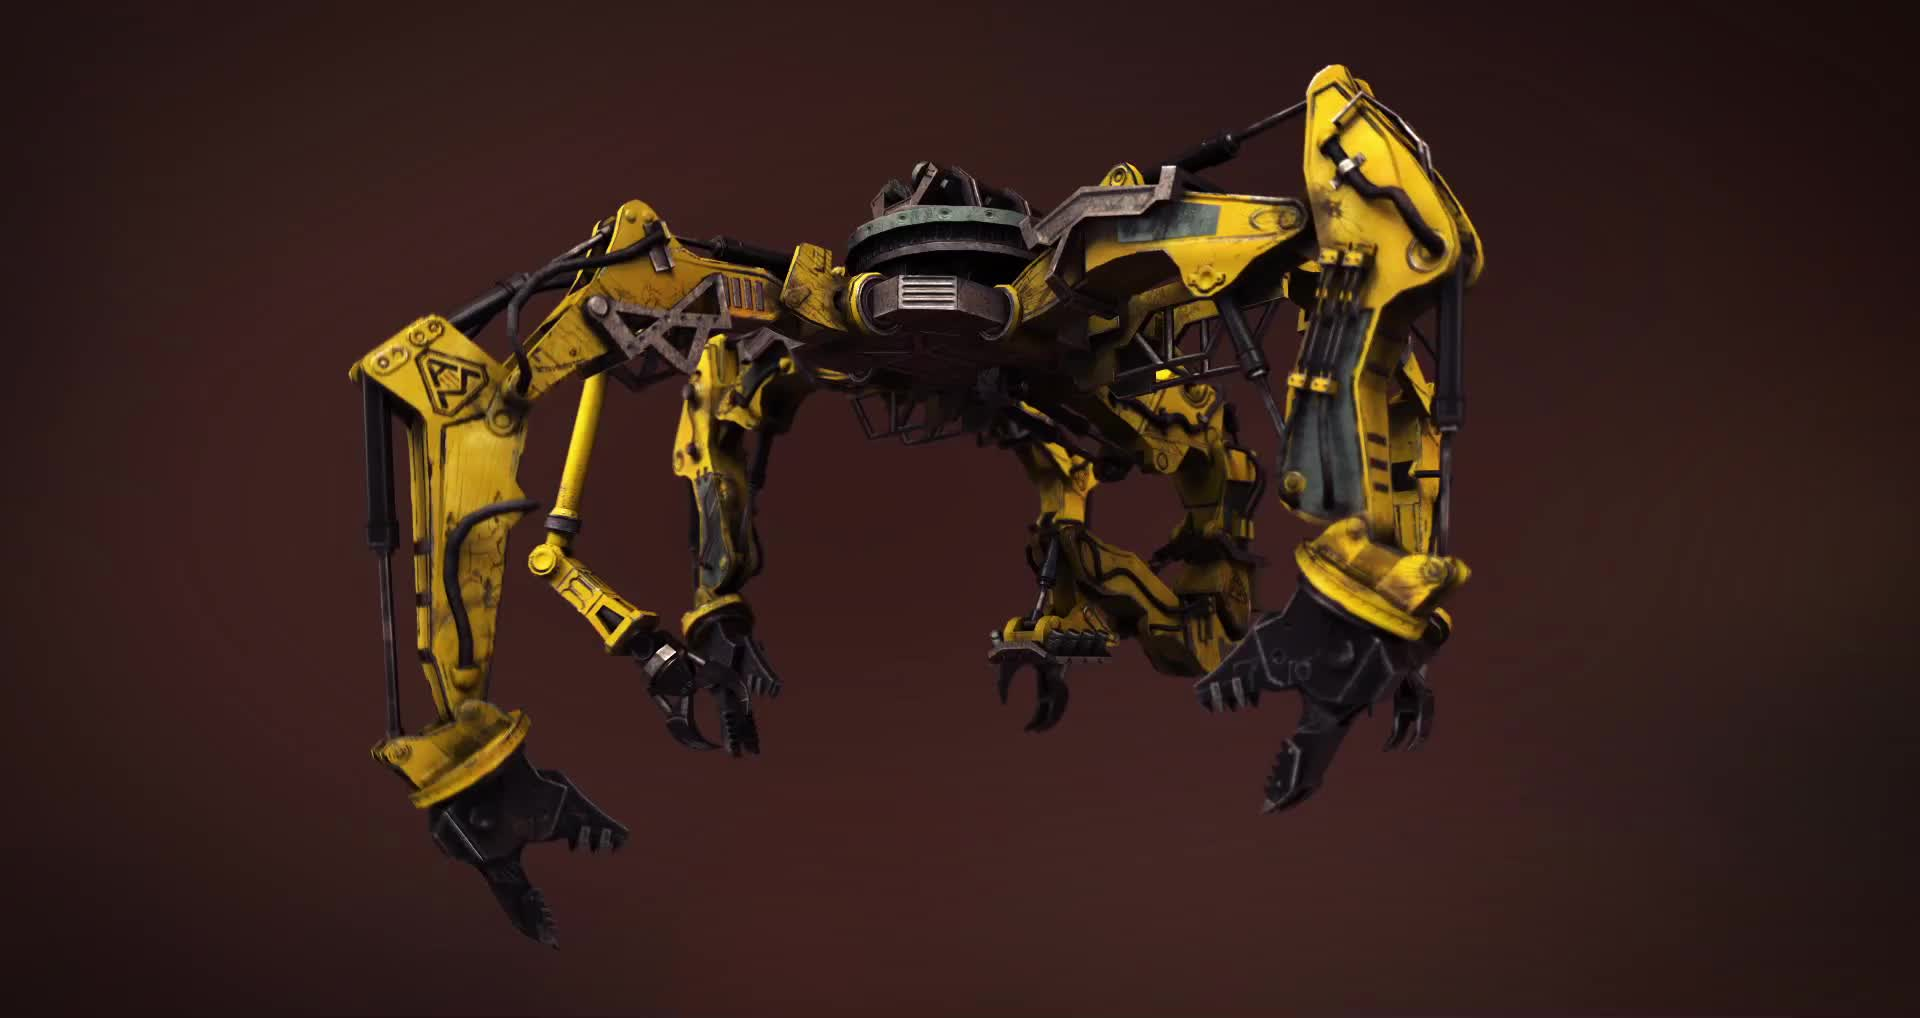 3Dmodeling, 3dmodeling, unity3d, Assembly Crane Turntable GIFs